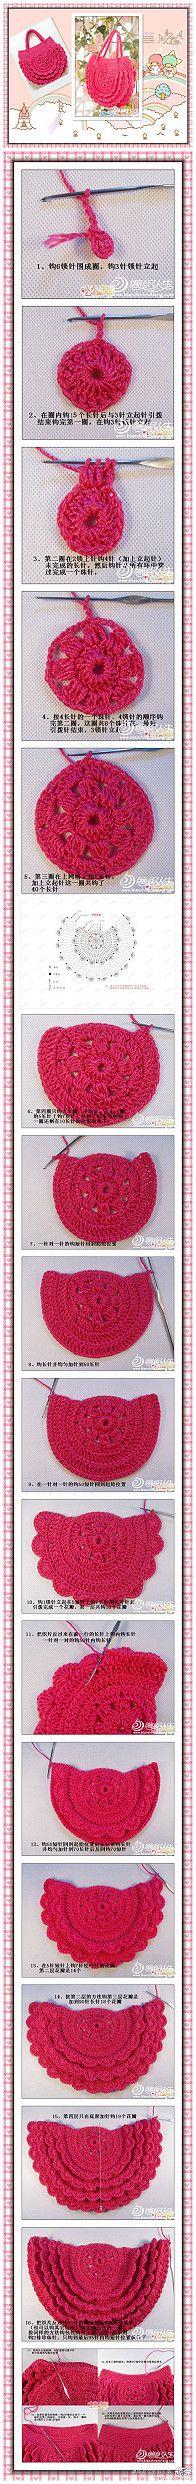 Crochet bag girl sweets 55 ideas for 2019 Crochet Diy, Crochet Motifs, Crochet Handbags, Crochet Purses, Knit Or Crochet, Crochet Crafts, Crochet Stitches, Crochet Projects, Crochet Patterns